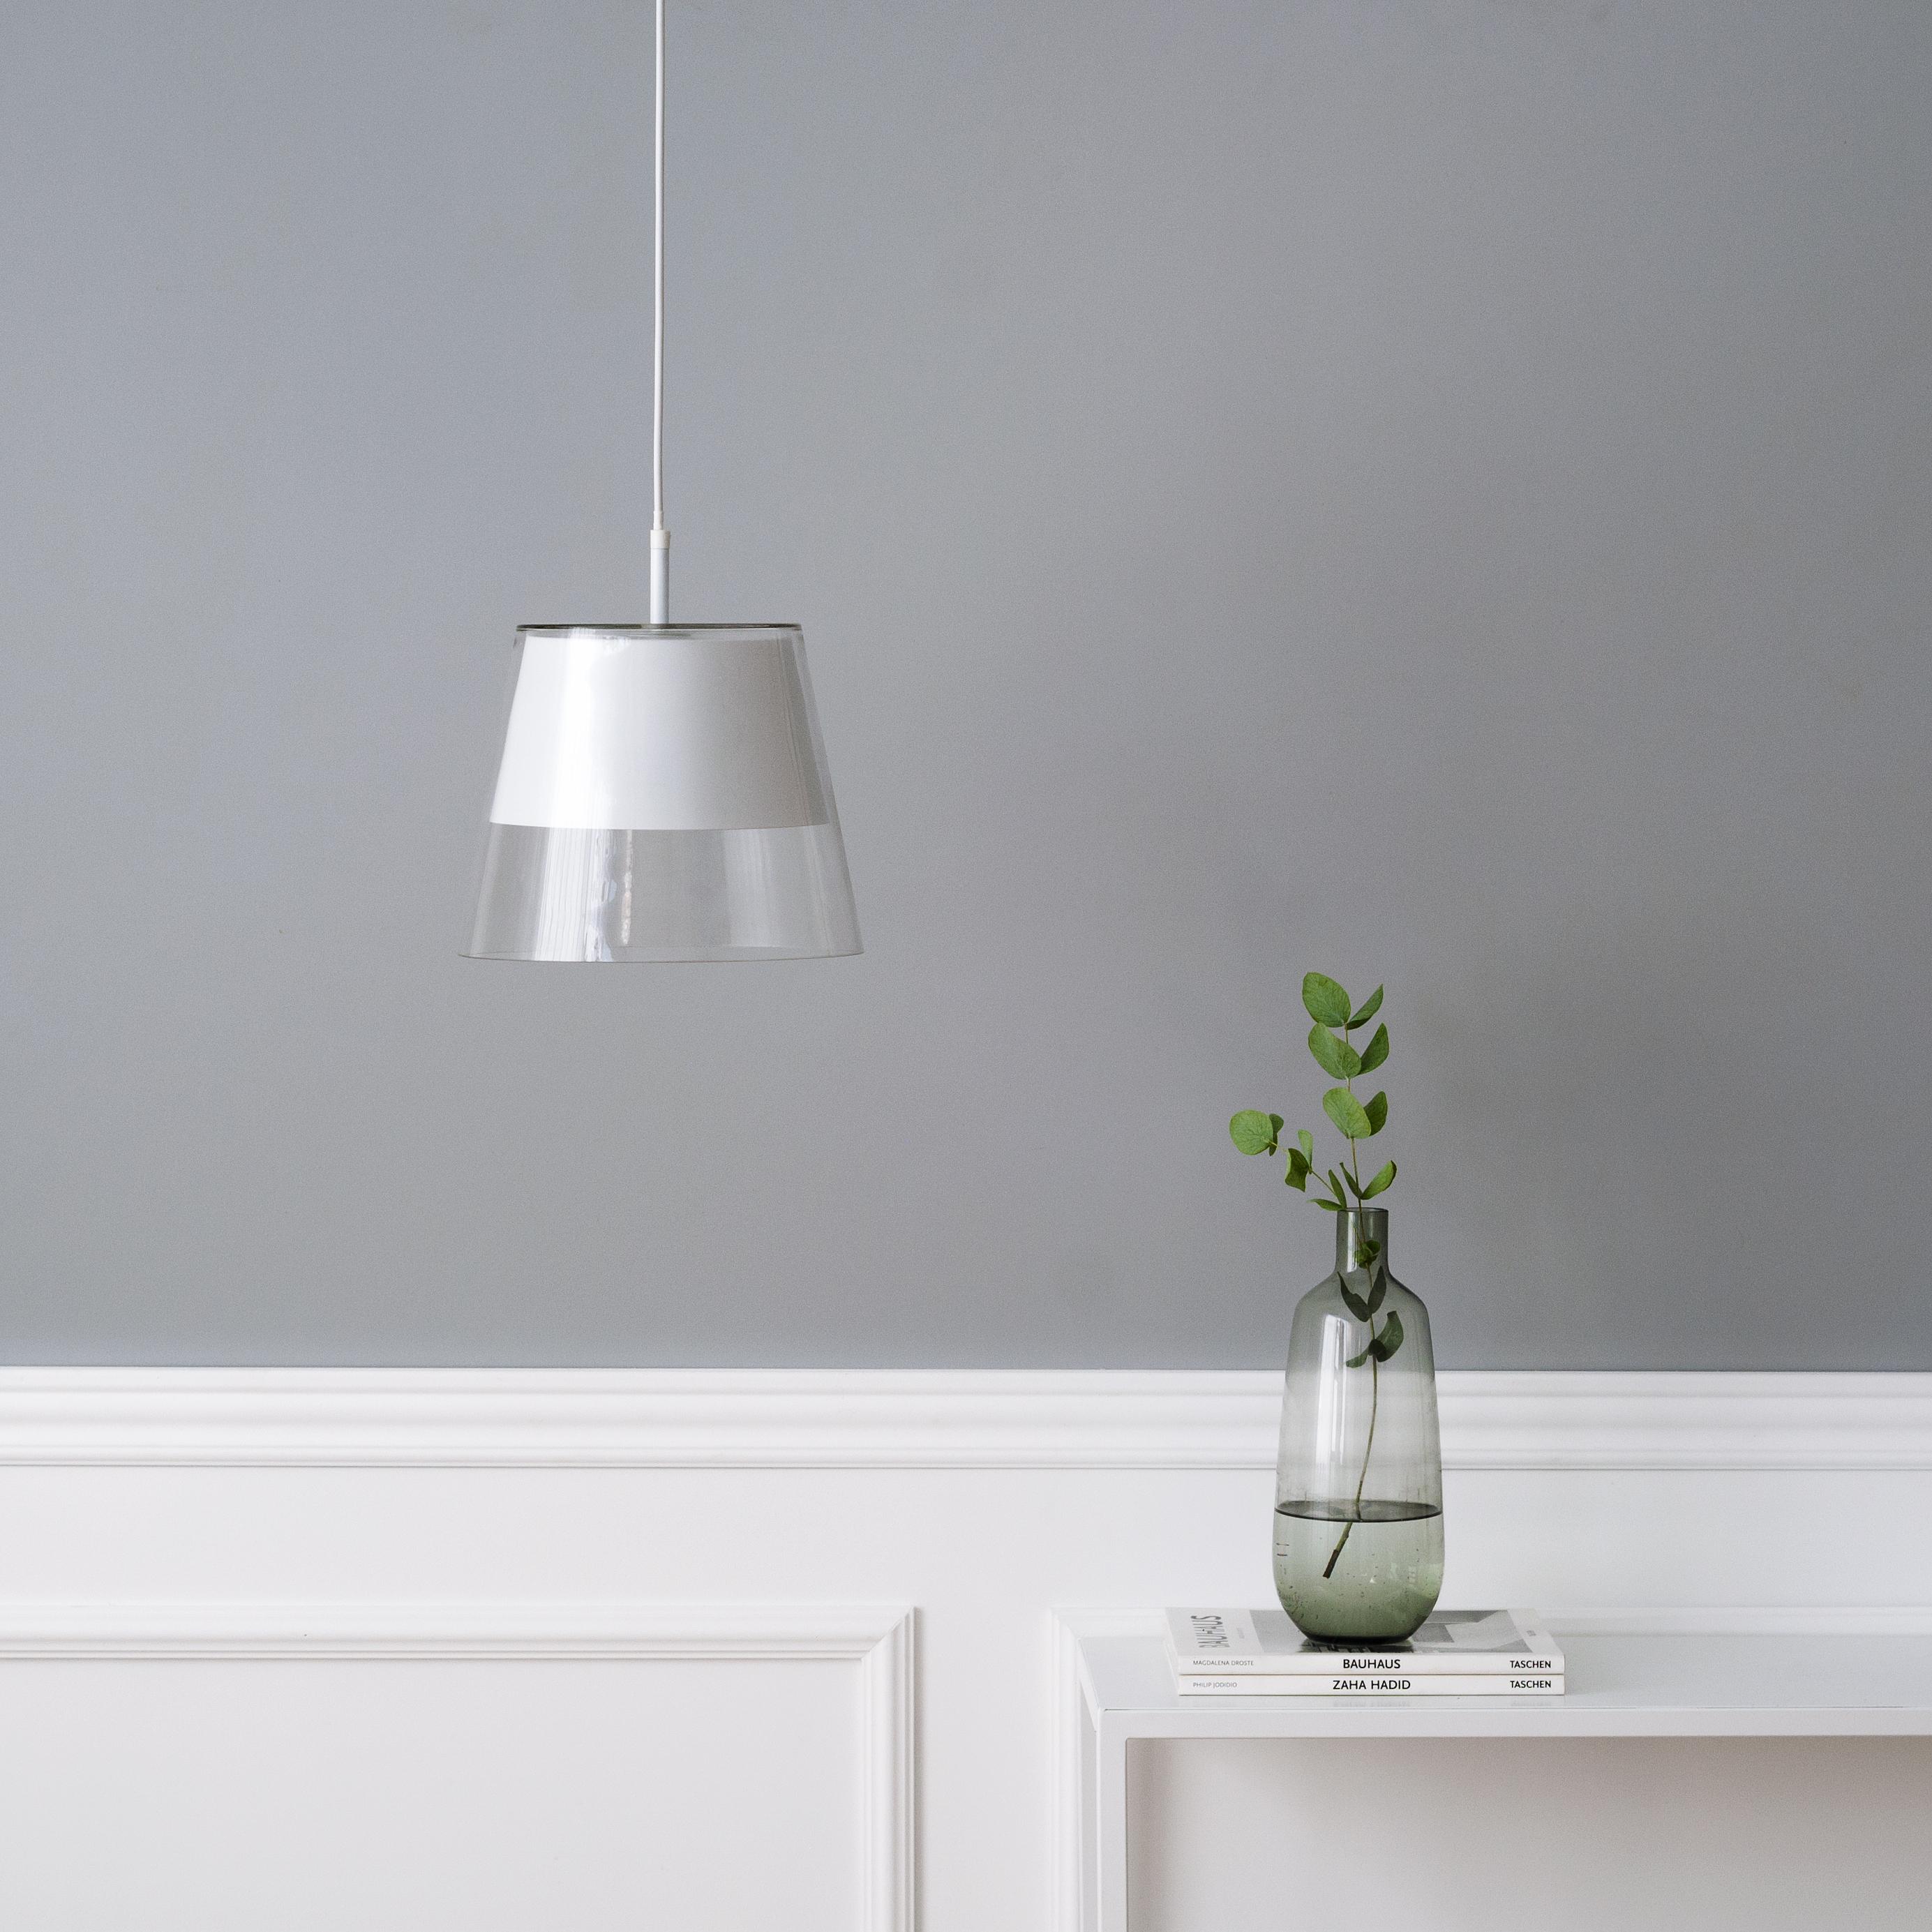 KJ-90087BL Divin lámpara de techo blanca 01